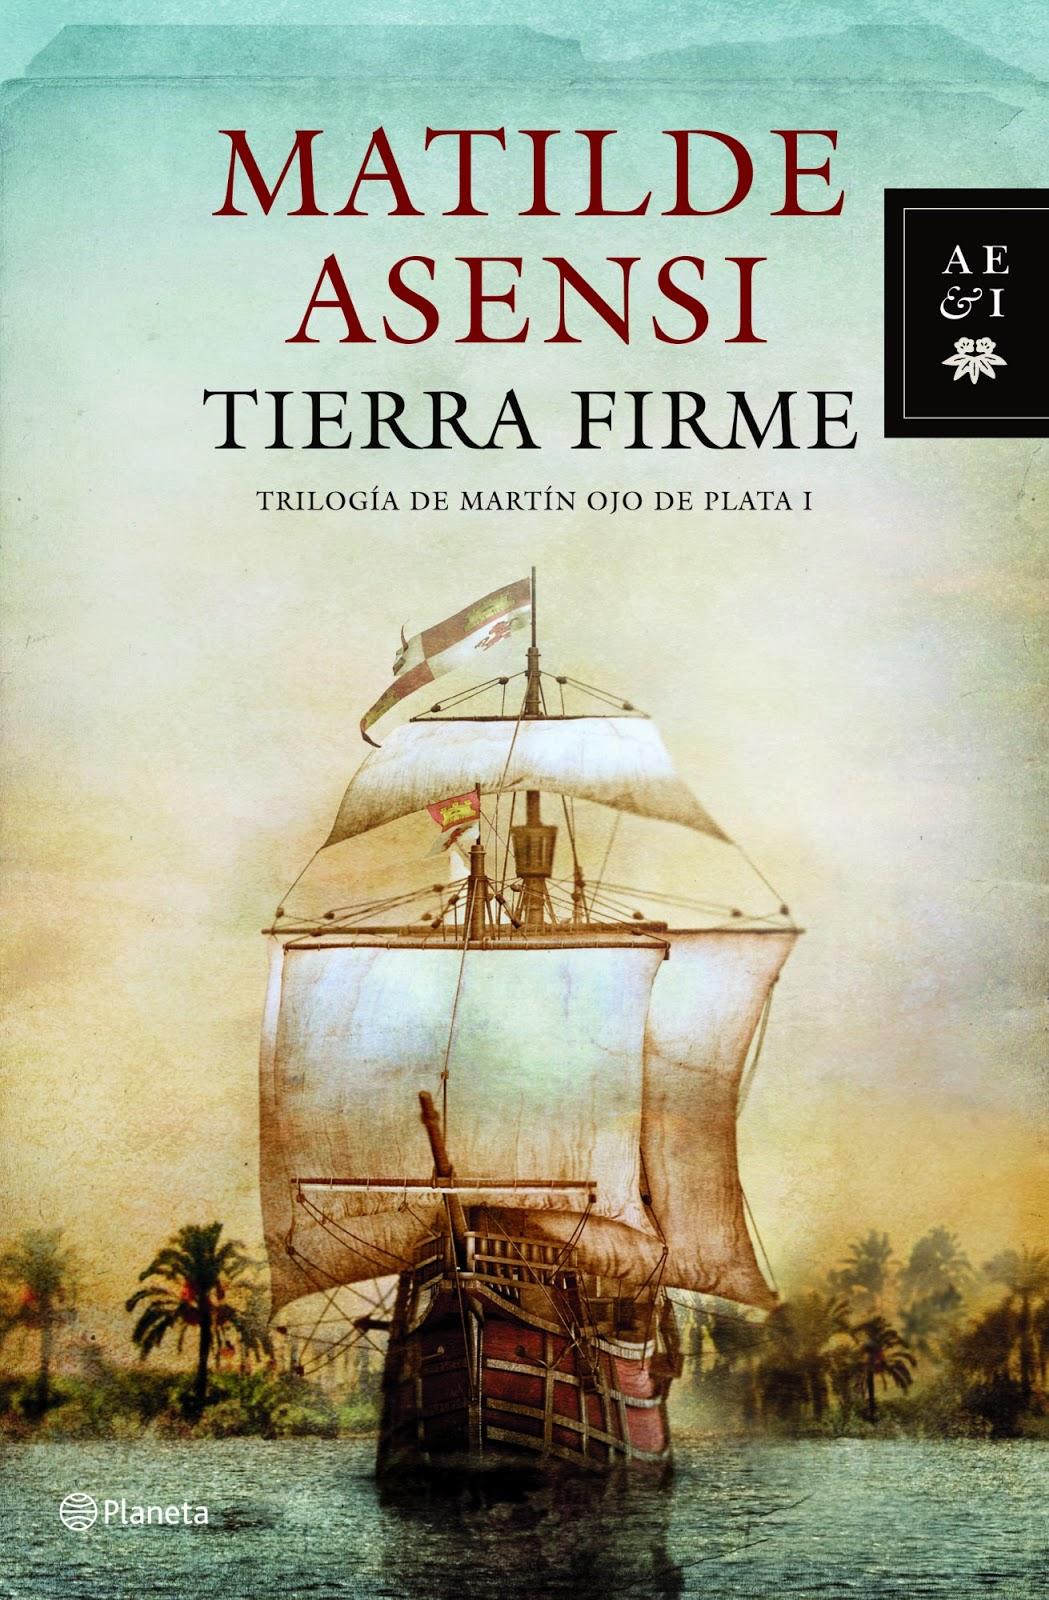 Oferta-Libro-Tierra-Firme-Matilde-Asensi